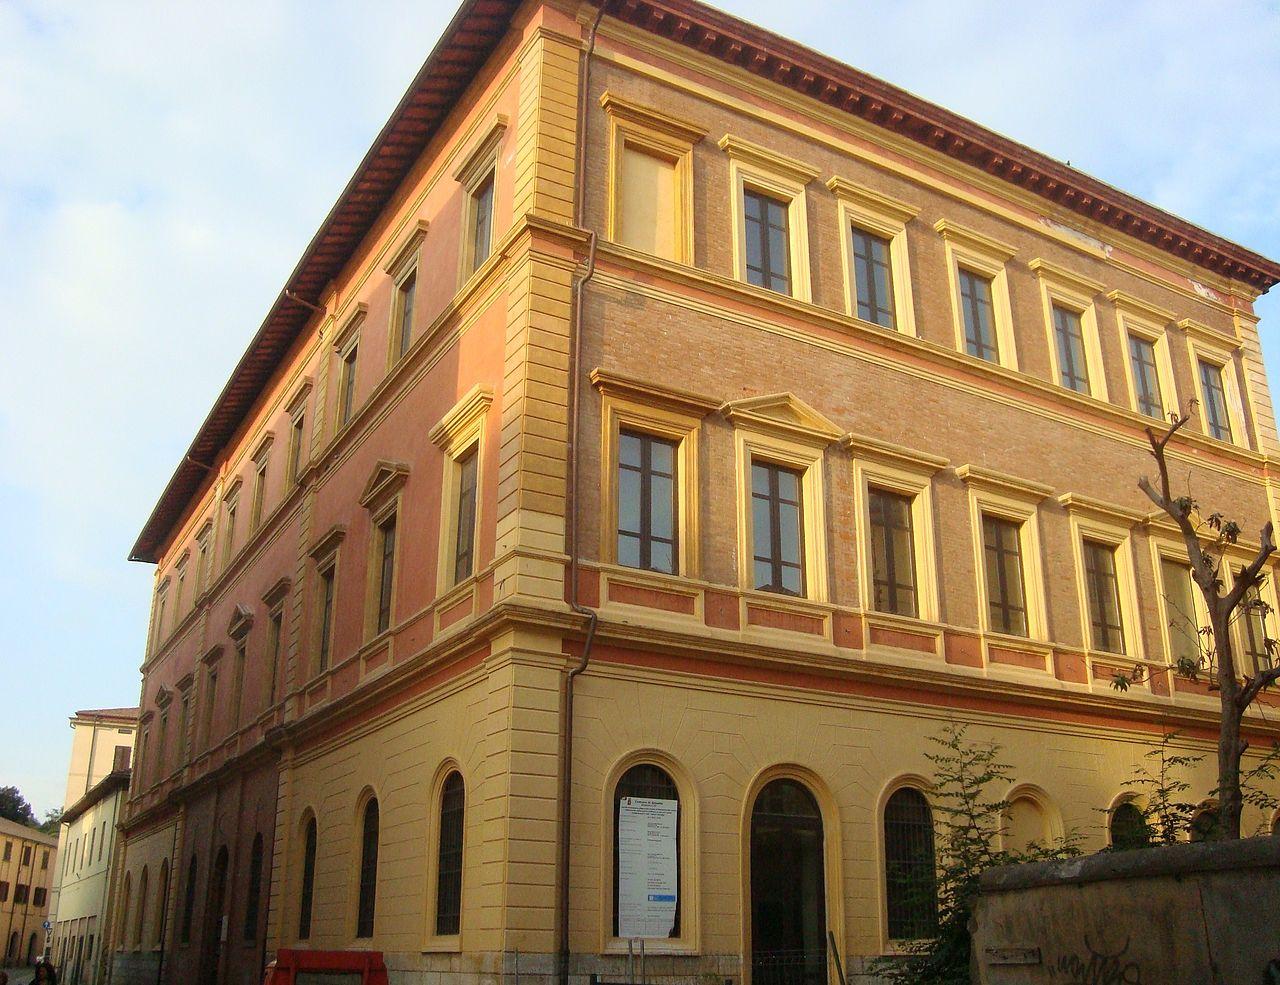 1280px-Biblioteca_Chelliana_Via_Mazzini